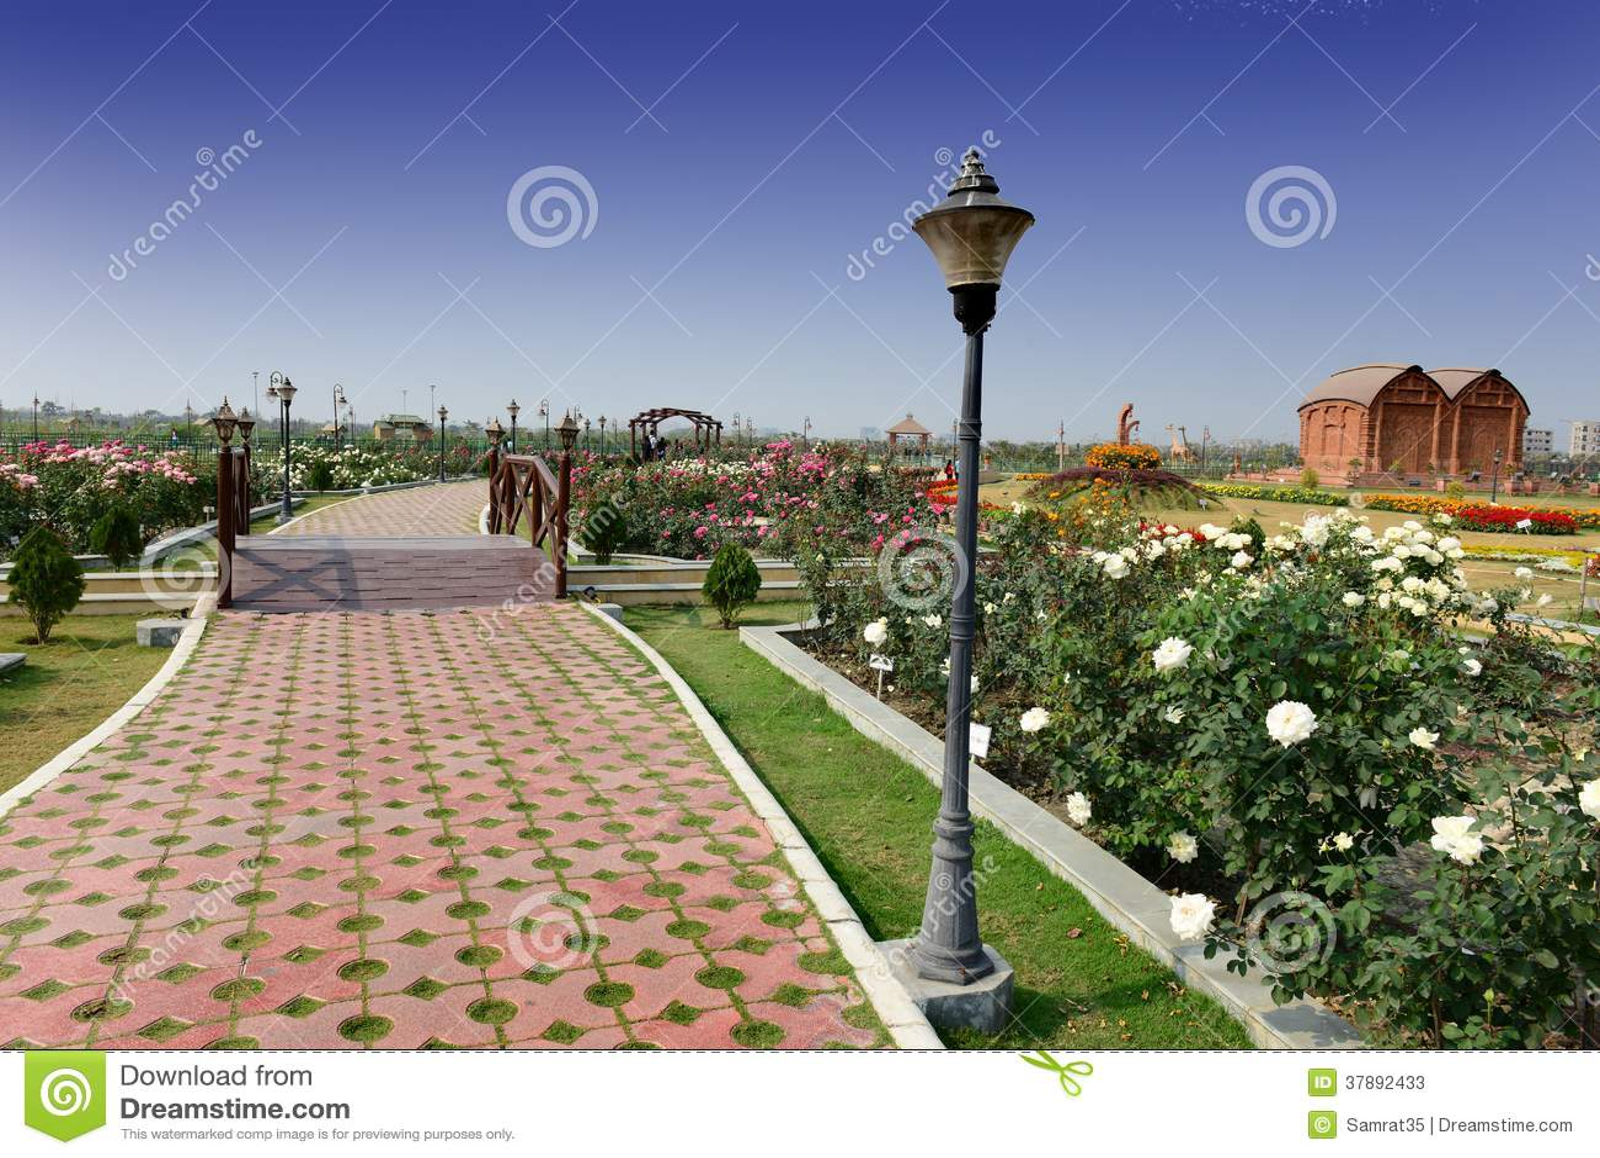 Het Park van Kolkataeco